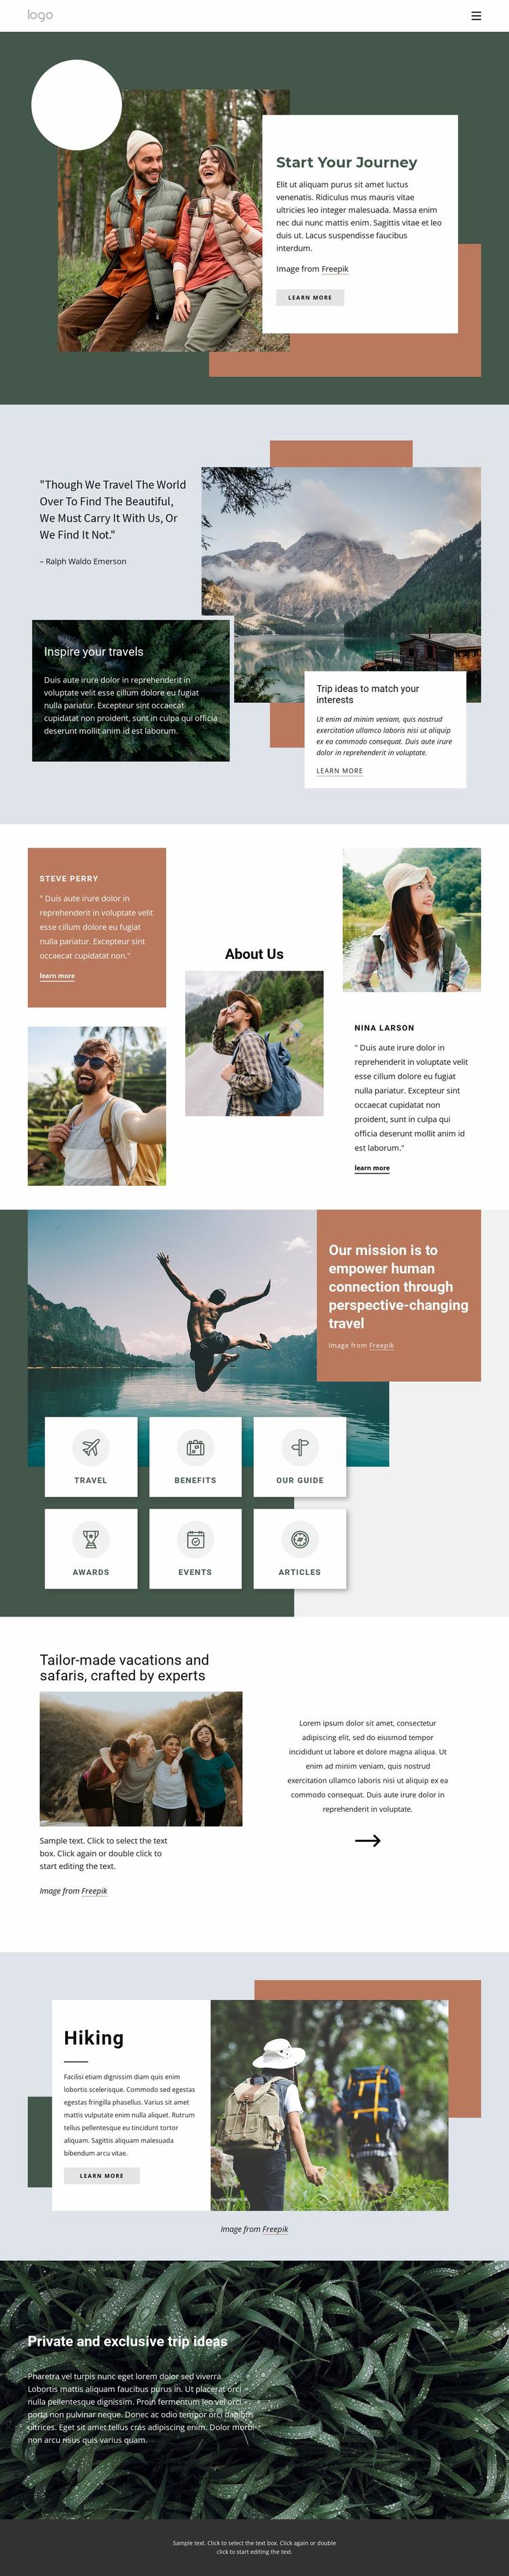 Adventure travel company Website Mockup